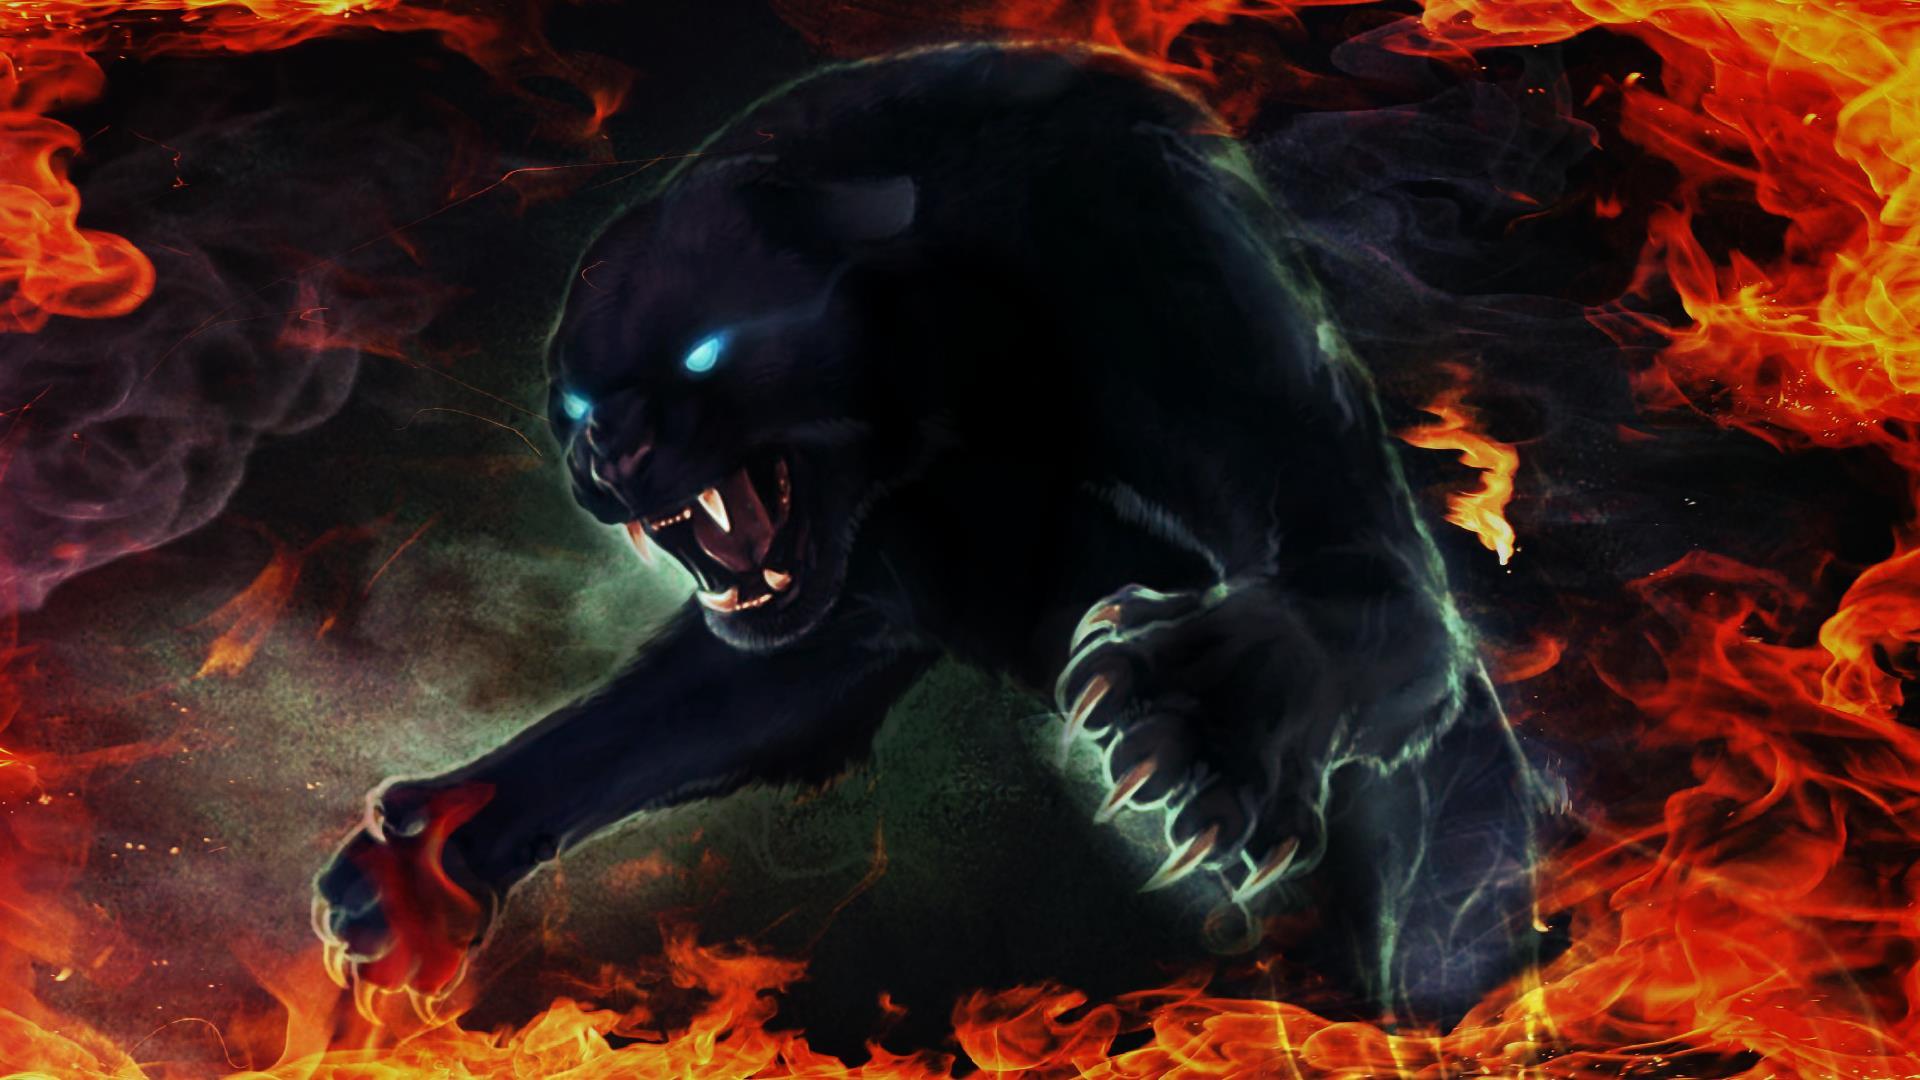 Black Panthers 5 Free Wallpaper - Hdblackwallpaper.com